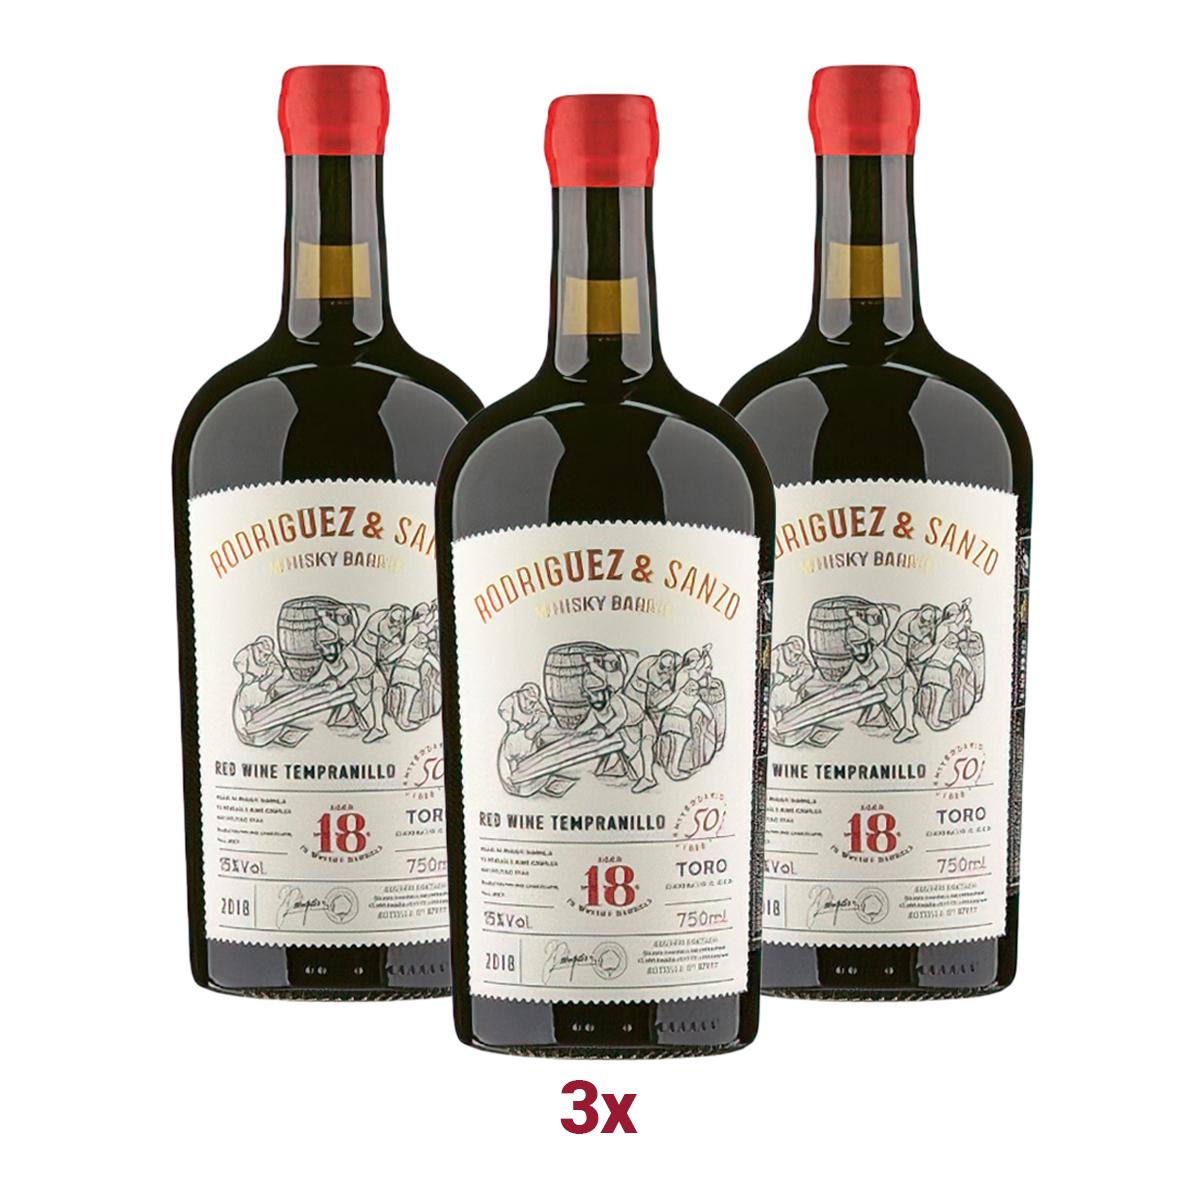 3x Rodriguez & Sanzo 2018 Tempranillo aus dem Whisky-Fass!